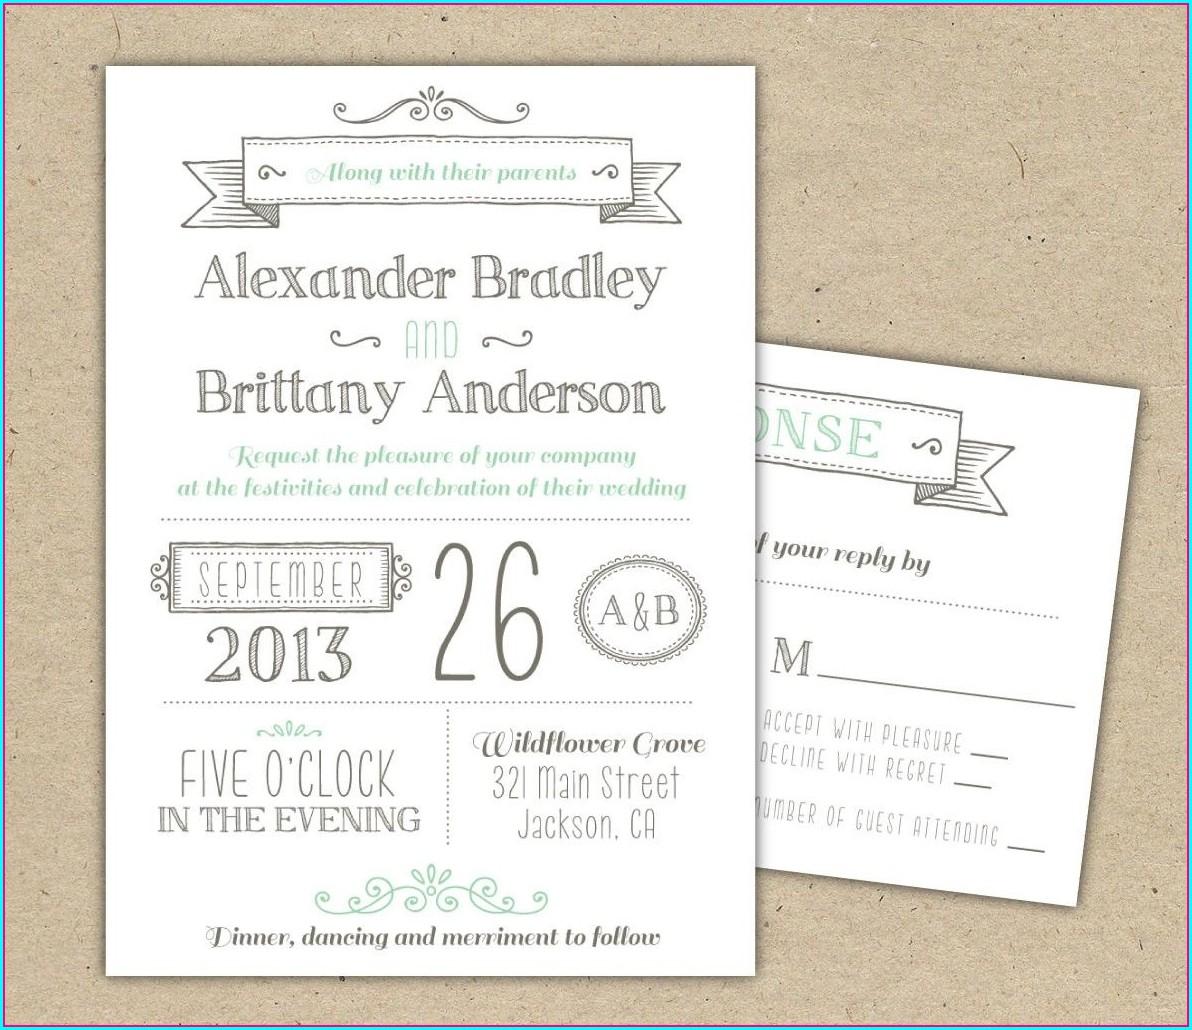 Downloadable Free Wedding Invitation Templates